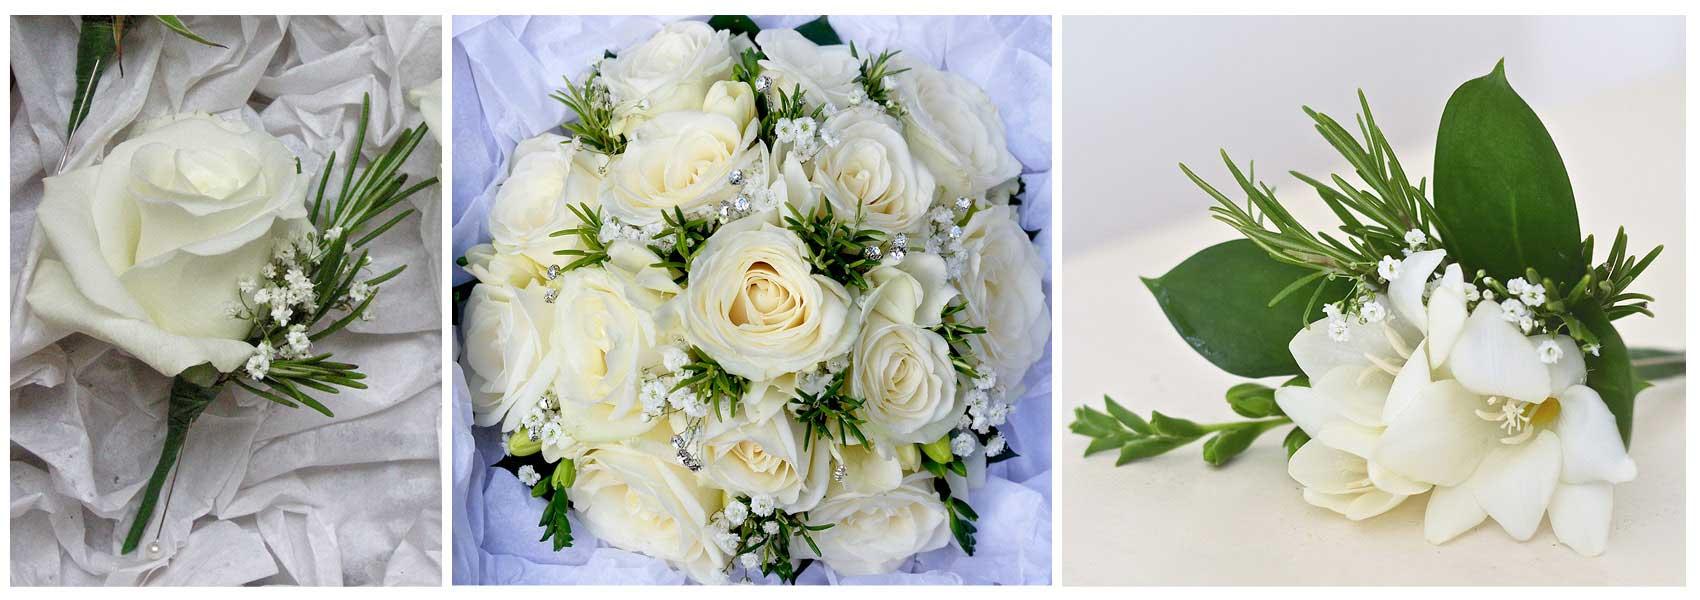 Fiori By Lynne Wedding Flowers Southampton Bouquets Buttonholes